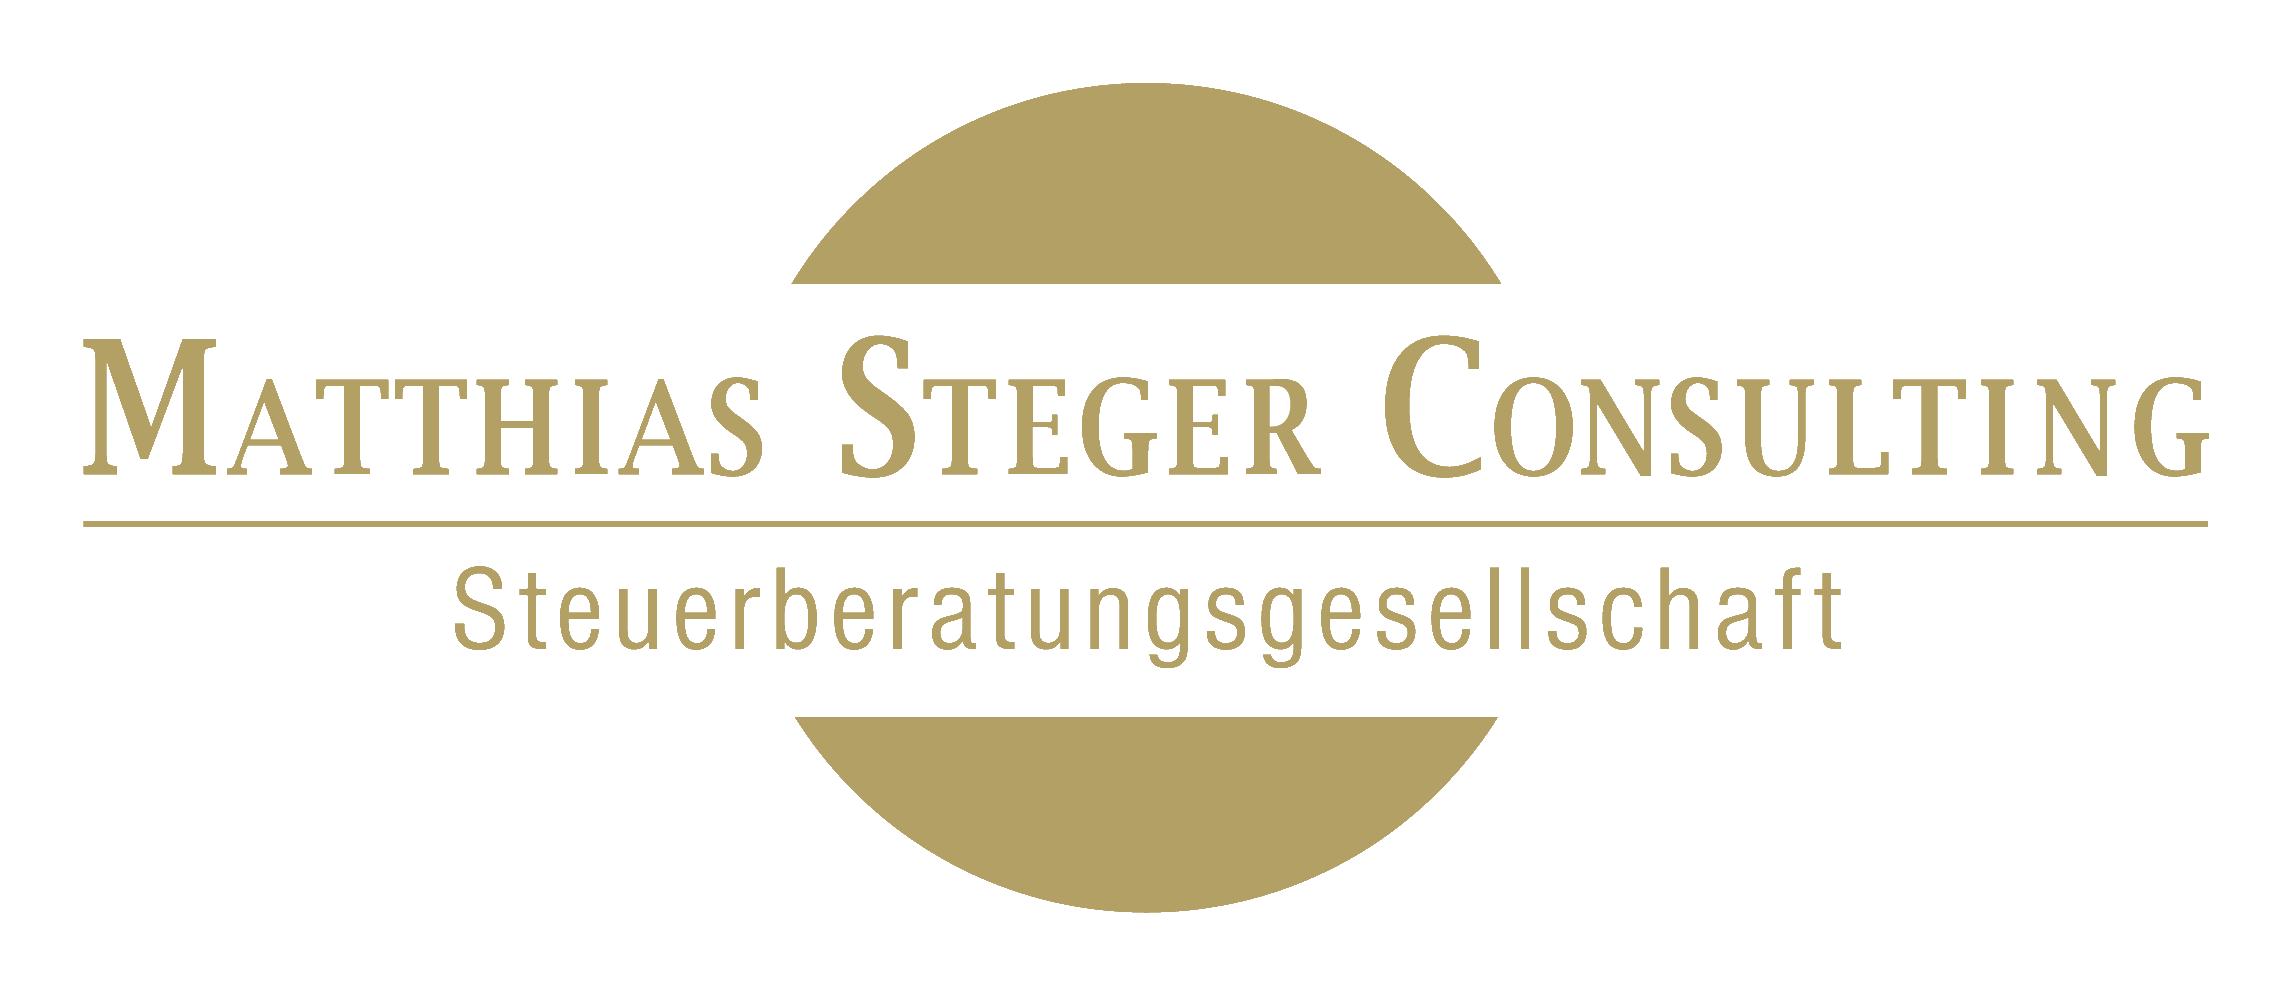 Matthias Steger Consulting Logo